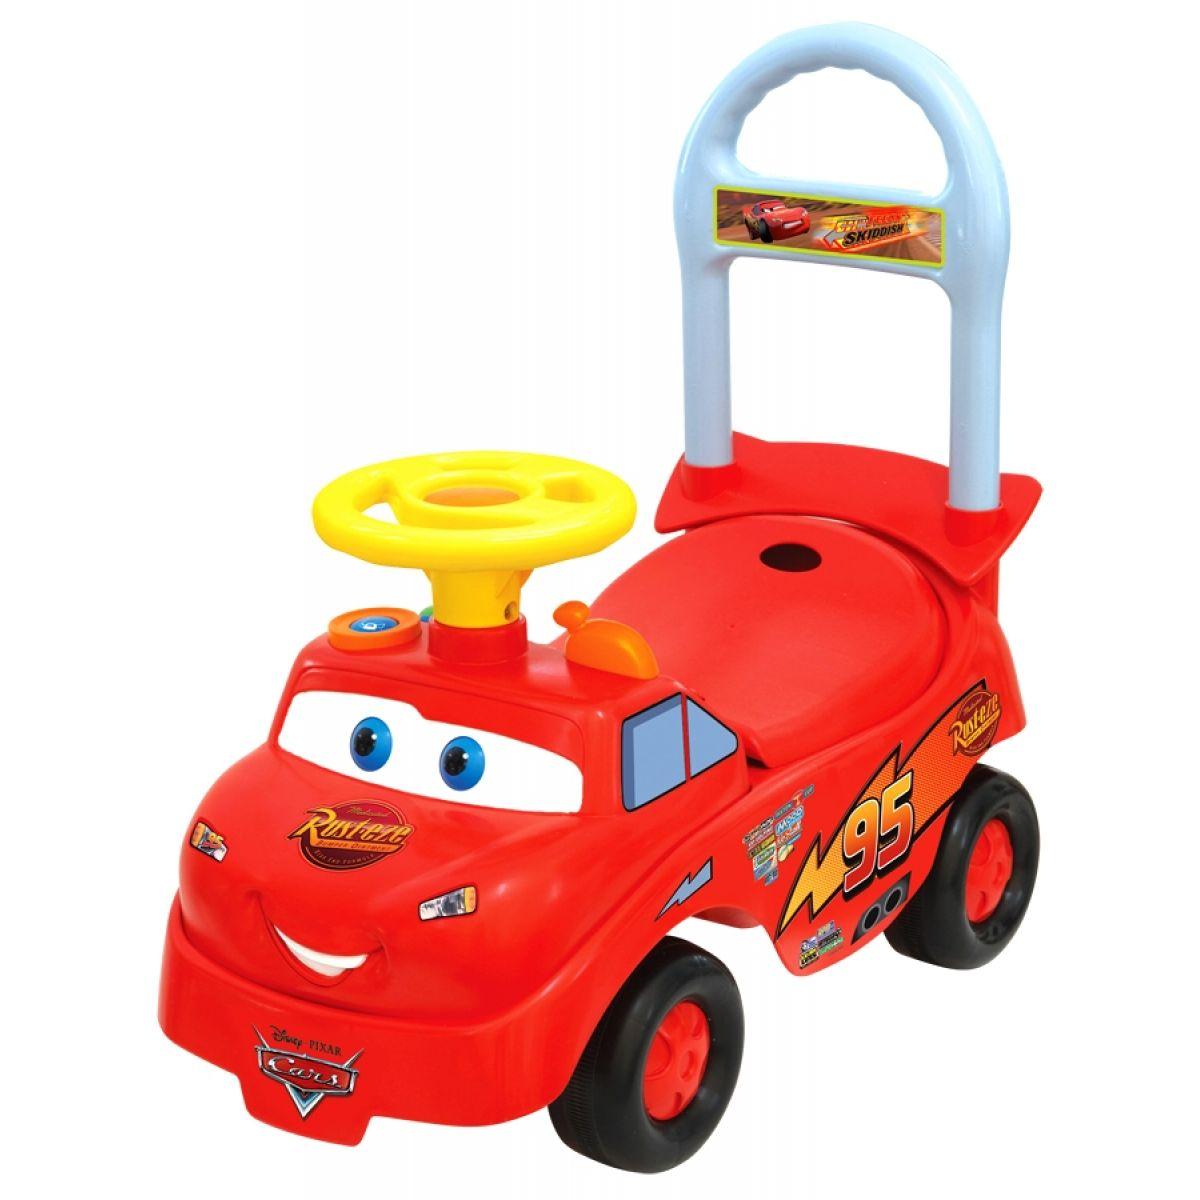 Kiddieland 034769 - Odstrkovadlo Cars McQueen se zvuky